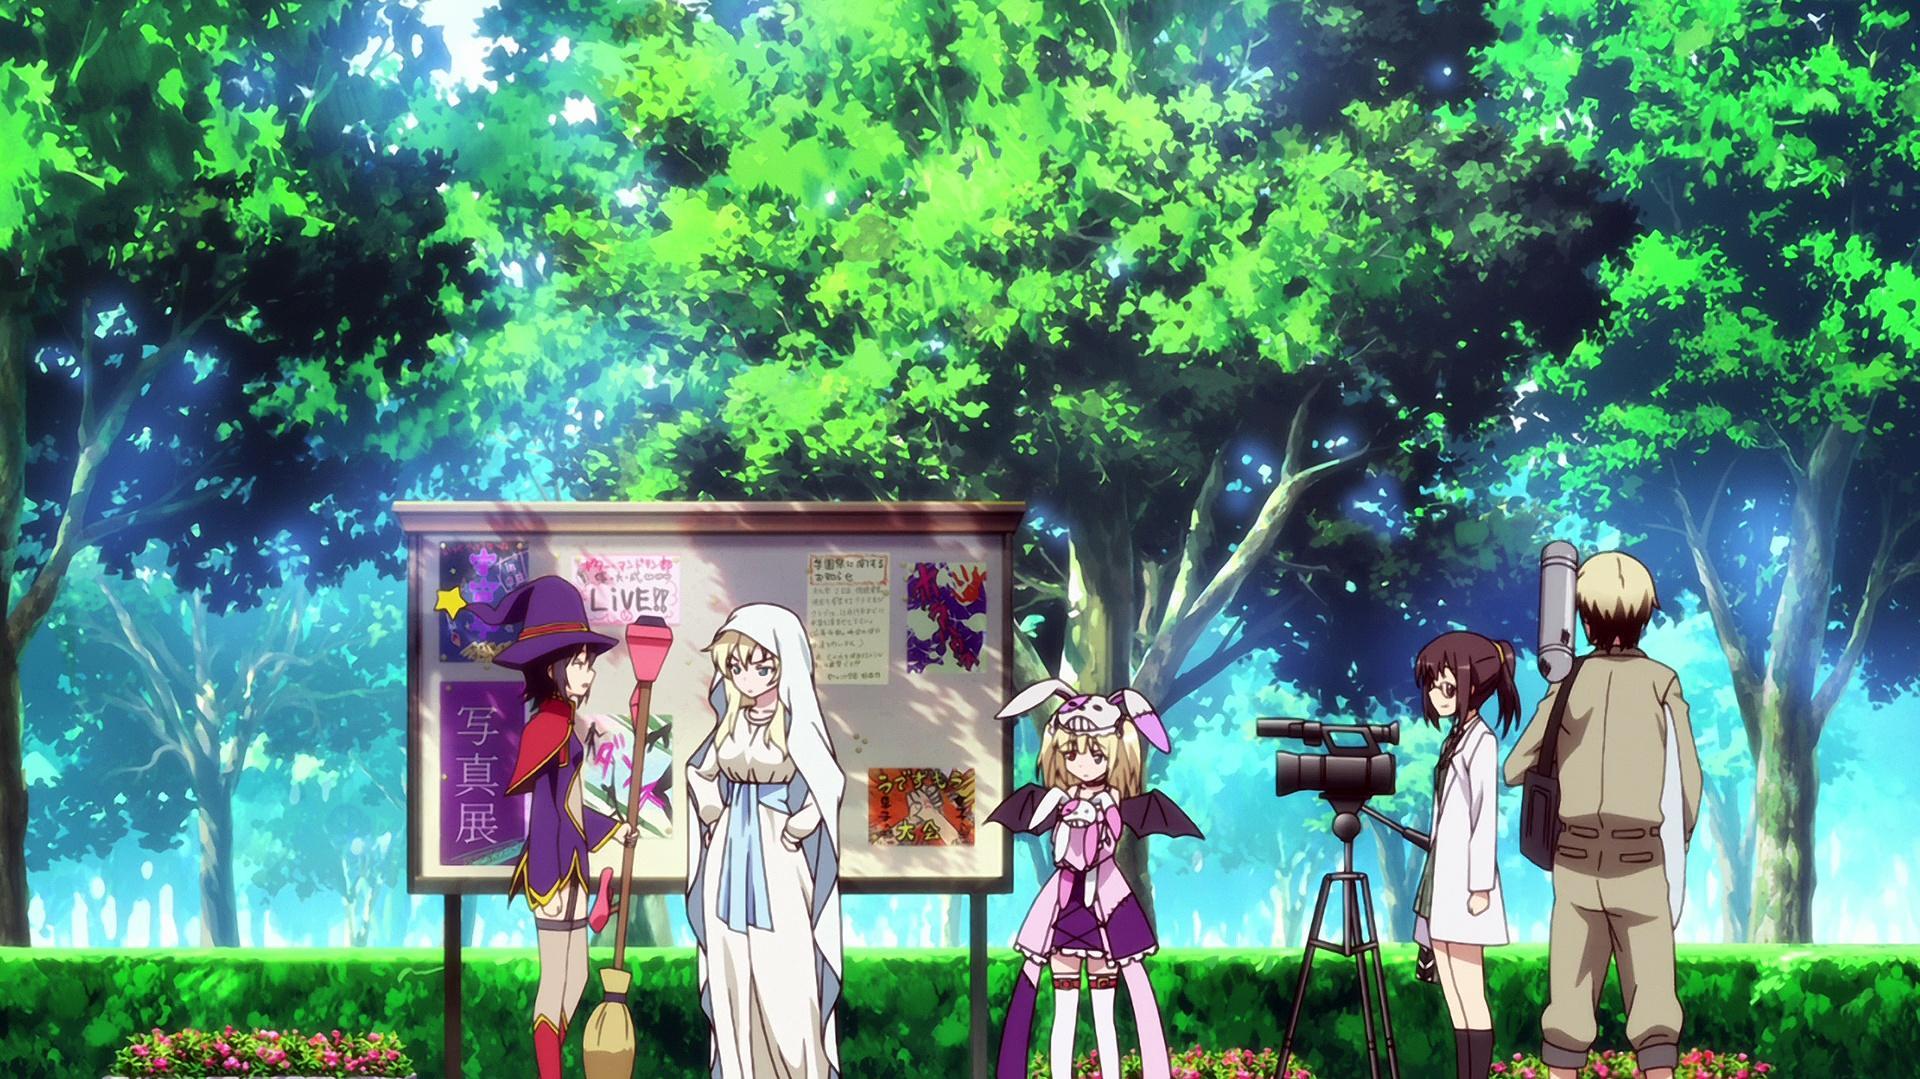 Boku wa Tomodachi ga Sukunai NEXT Opening (1080p Creditless)